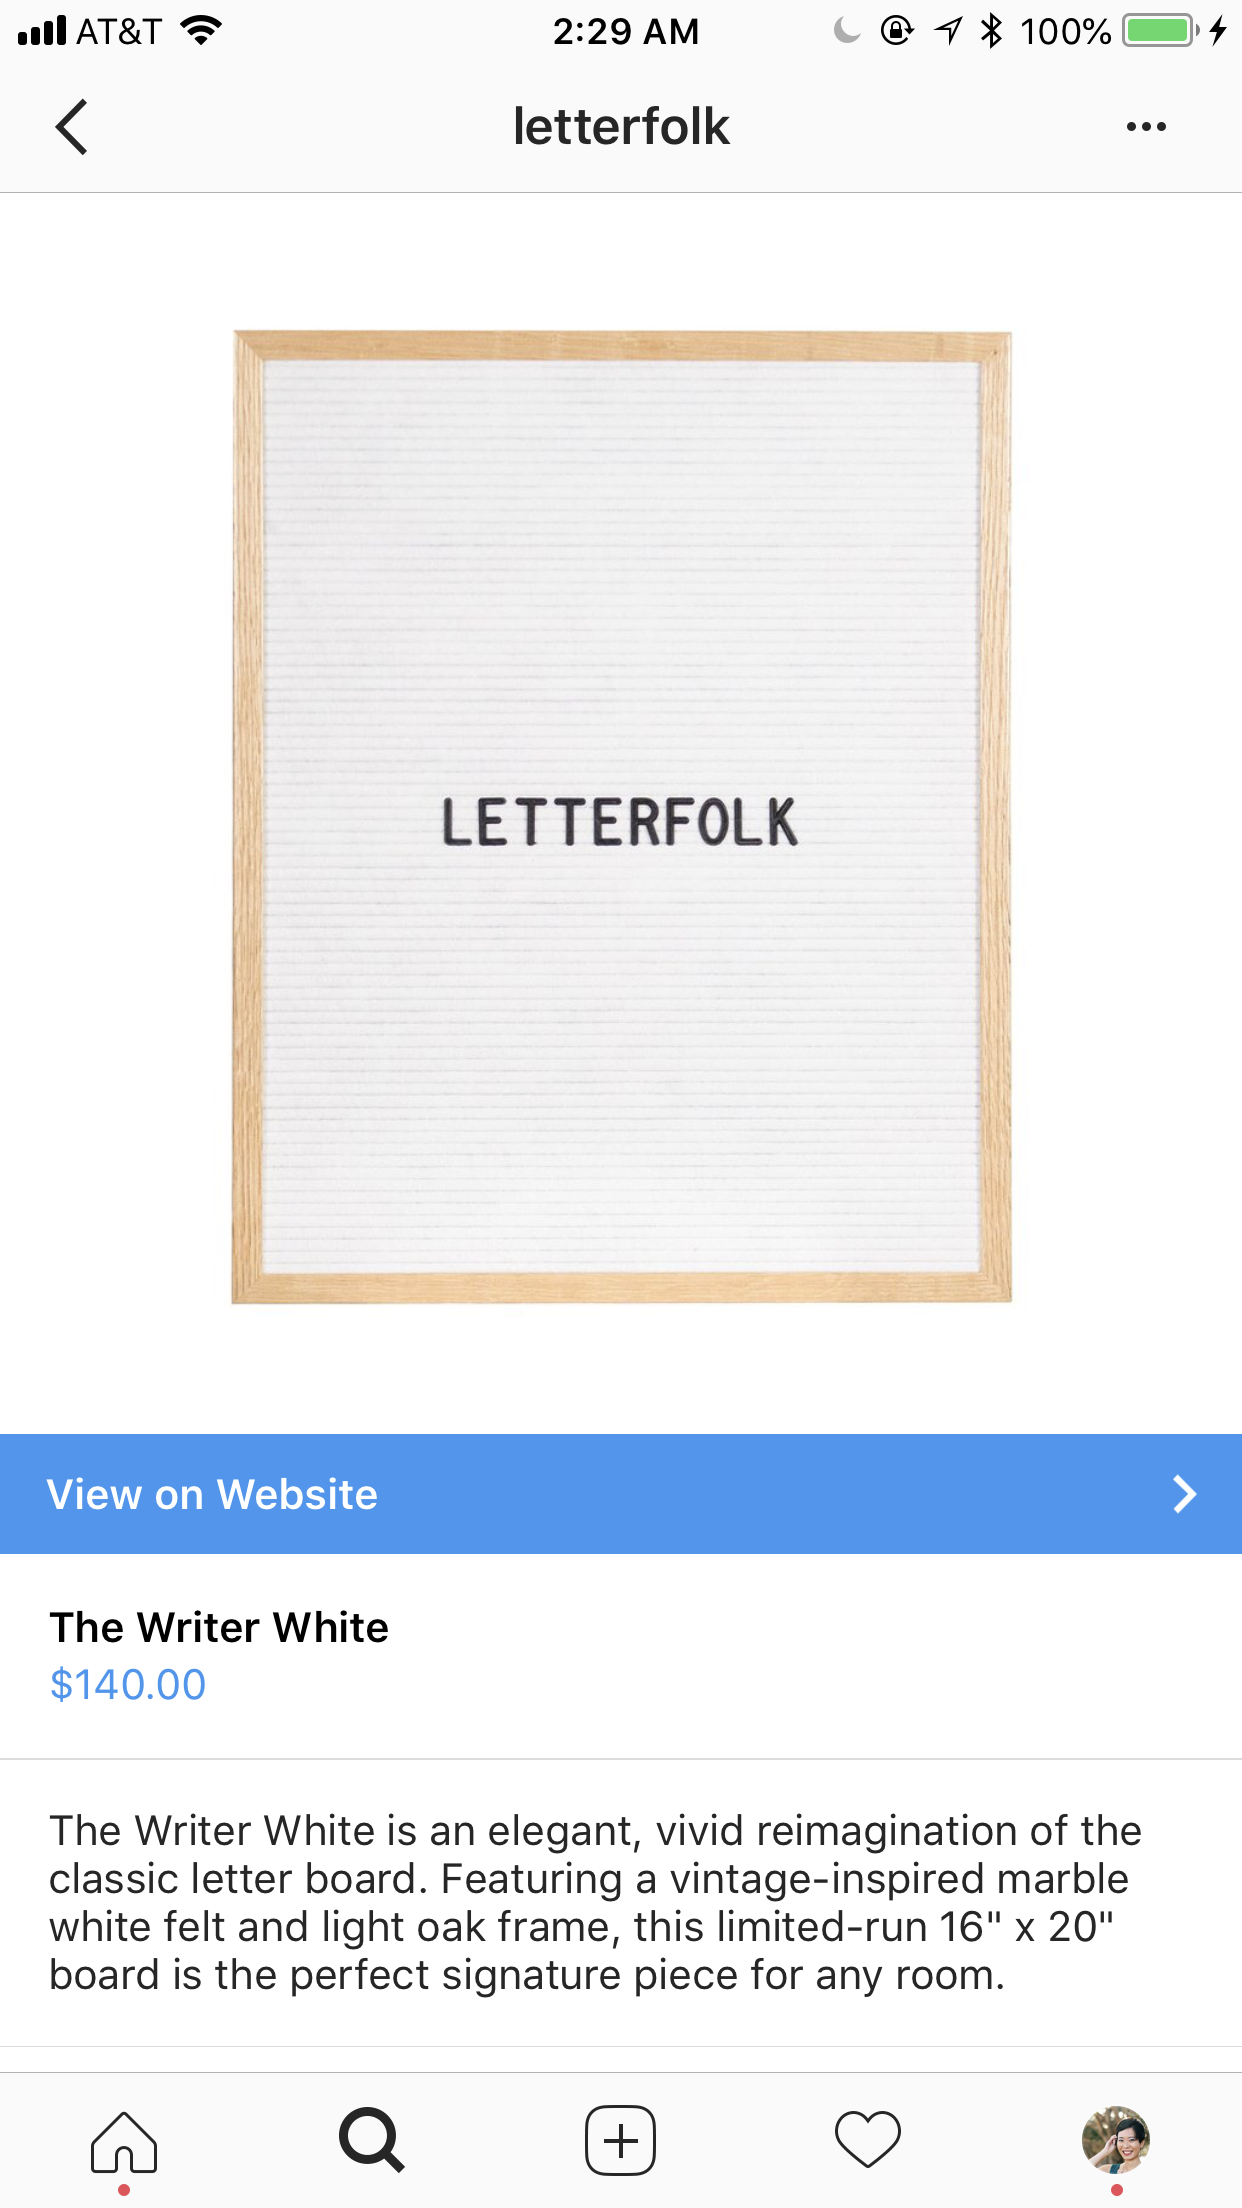 letterfolk product